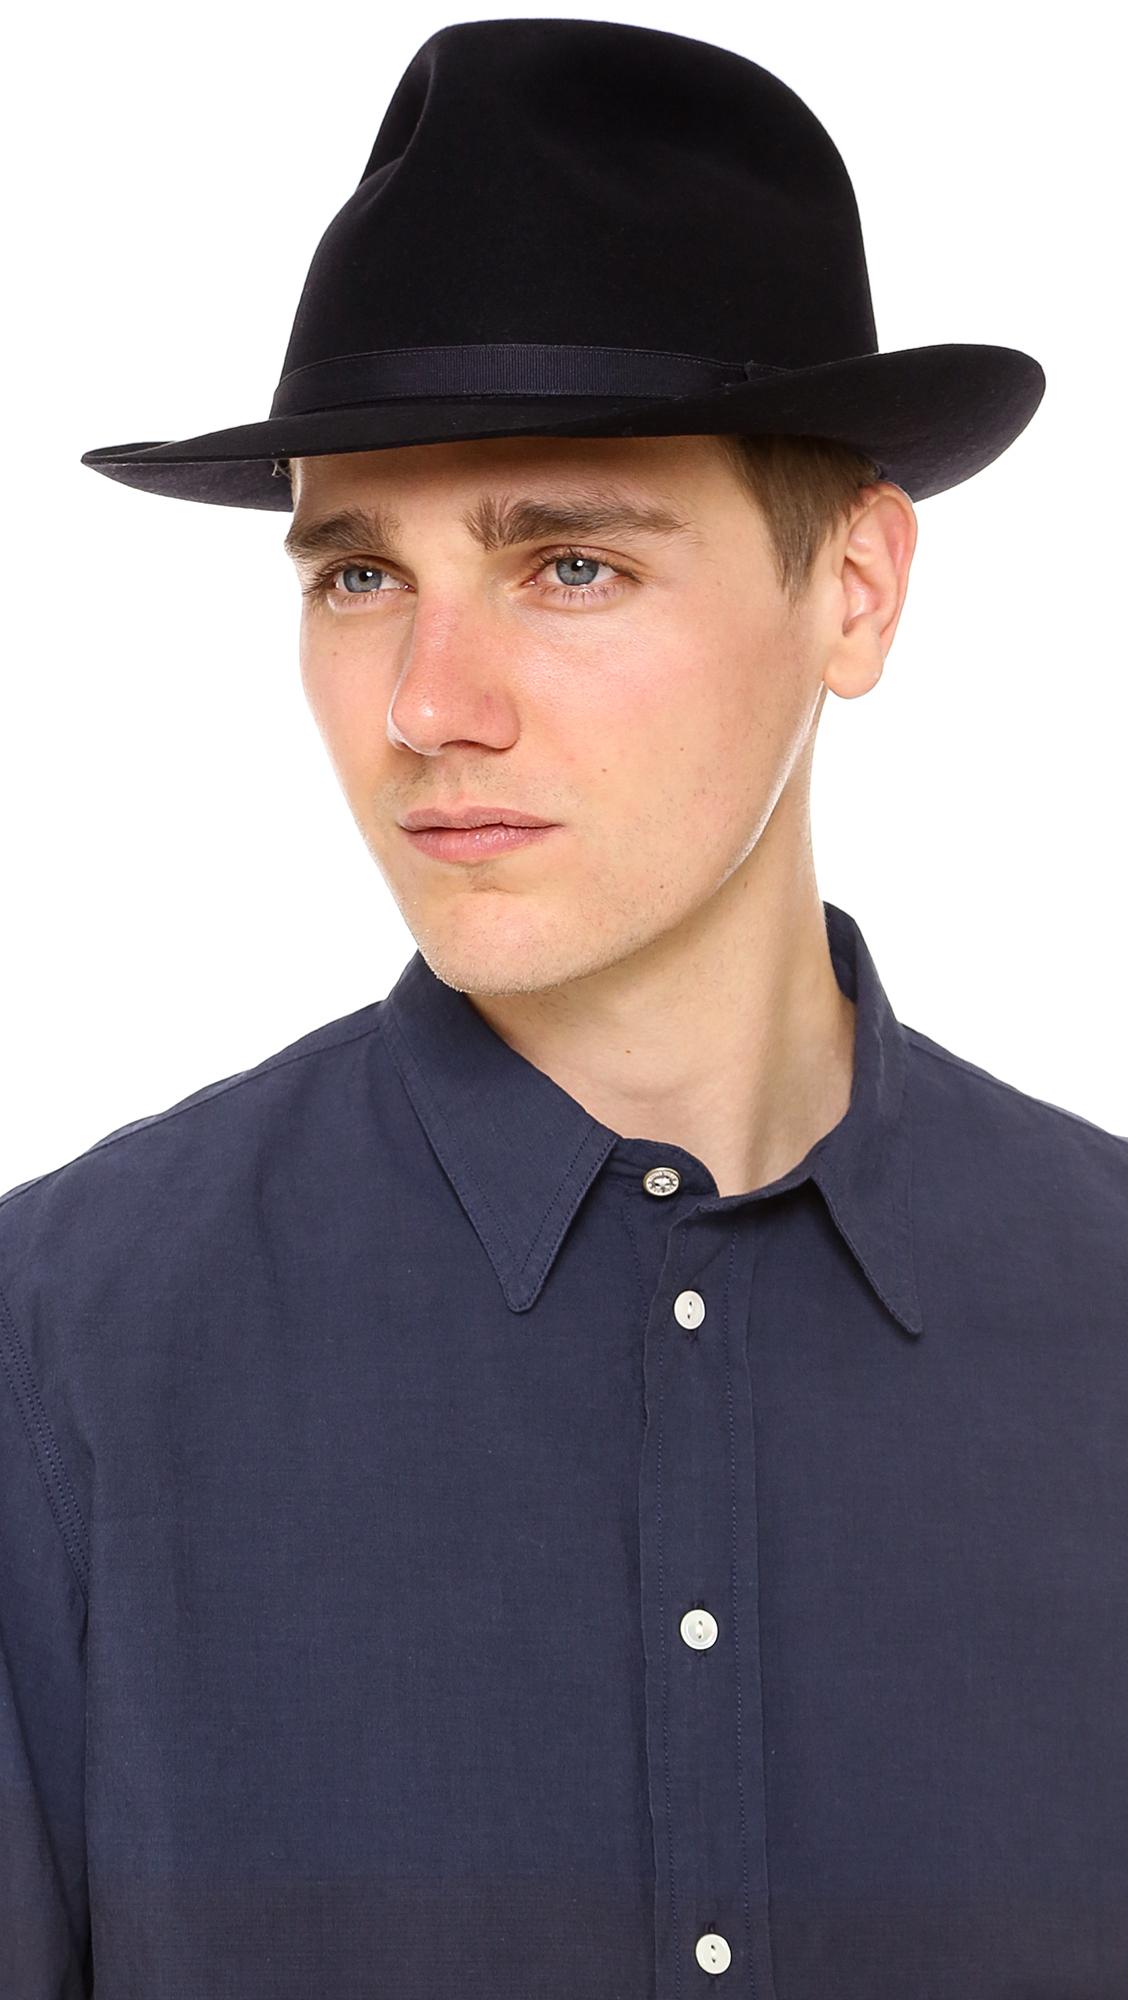 Lyst - Lock   Co. Voyager Felt Hat in Blue for Men 99fe0884614